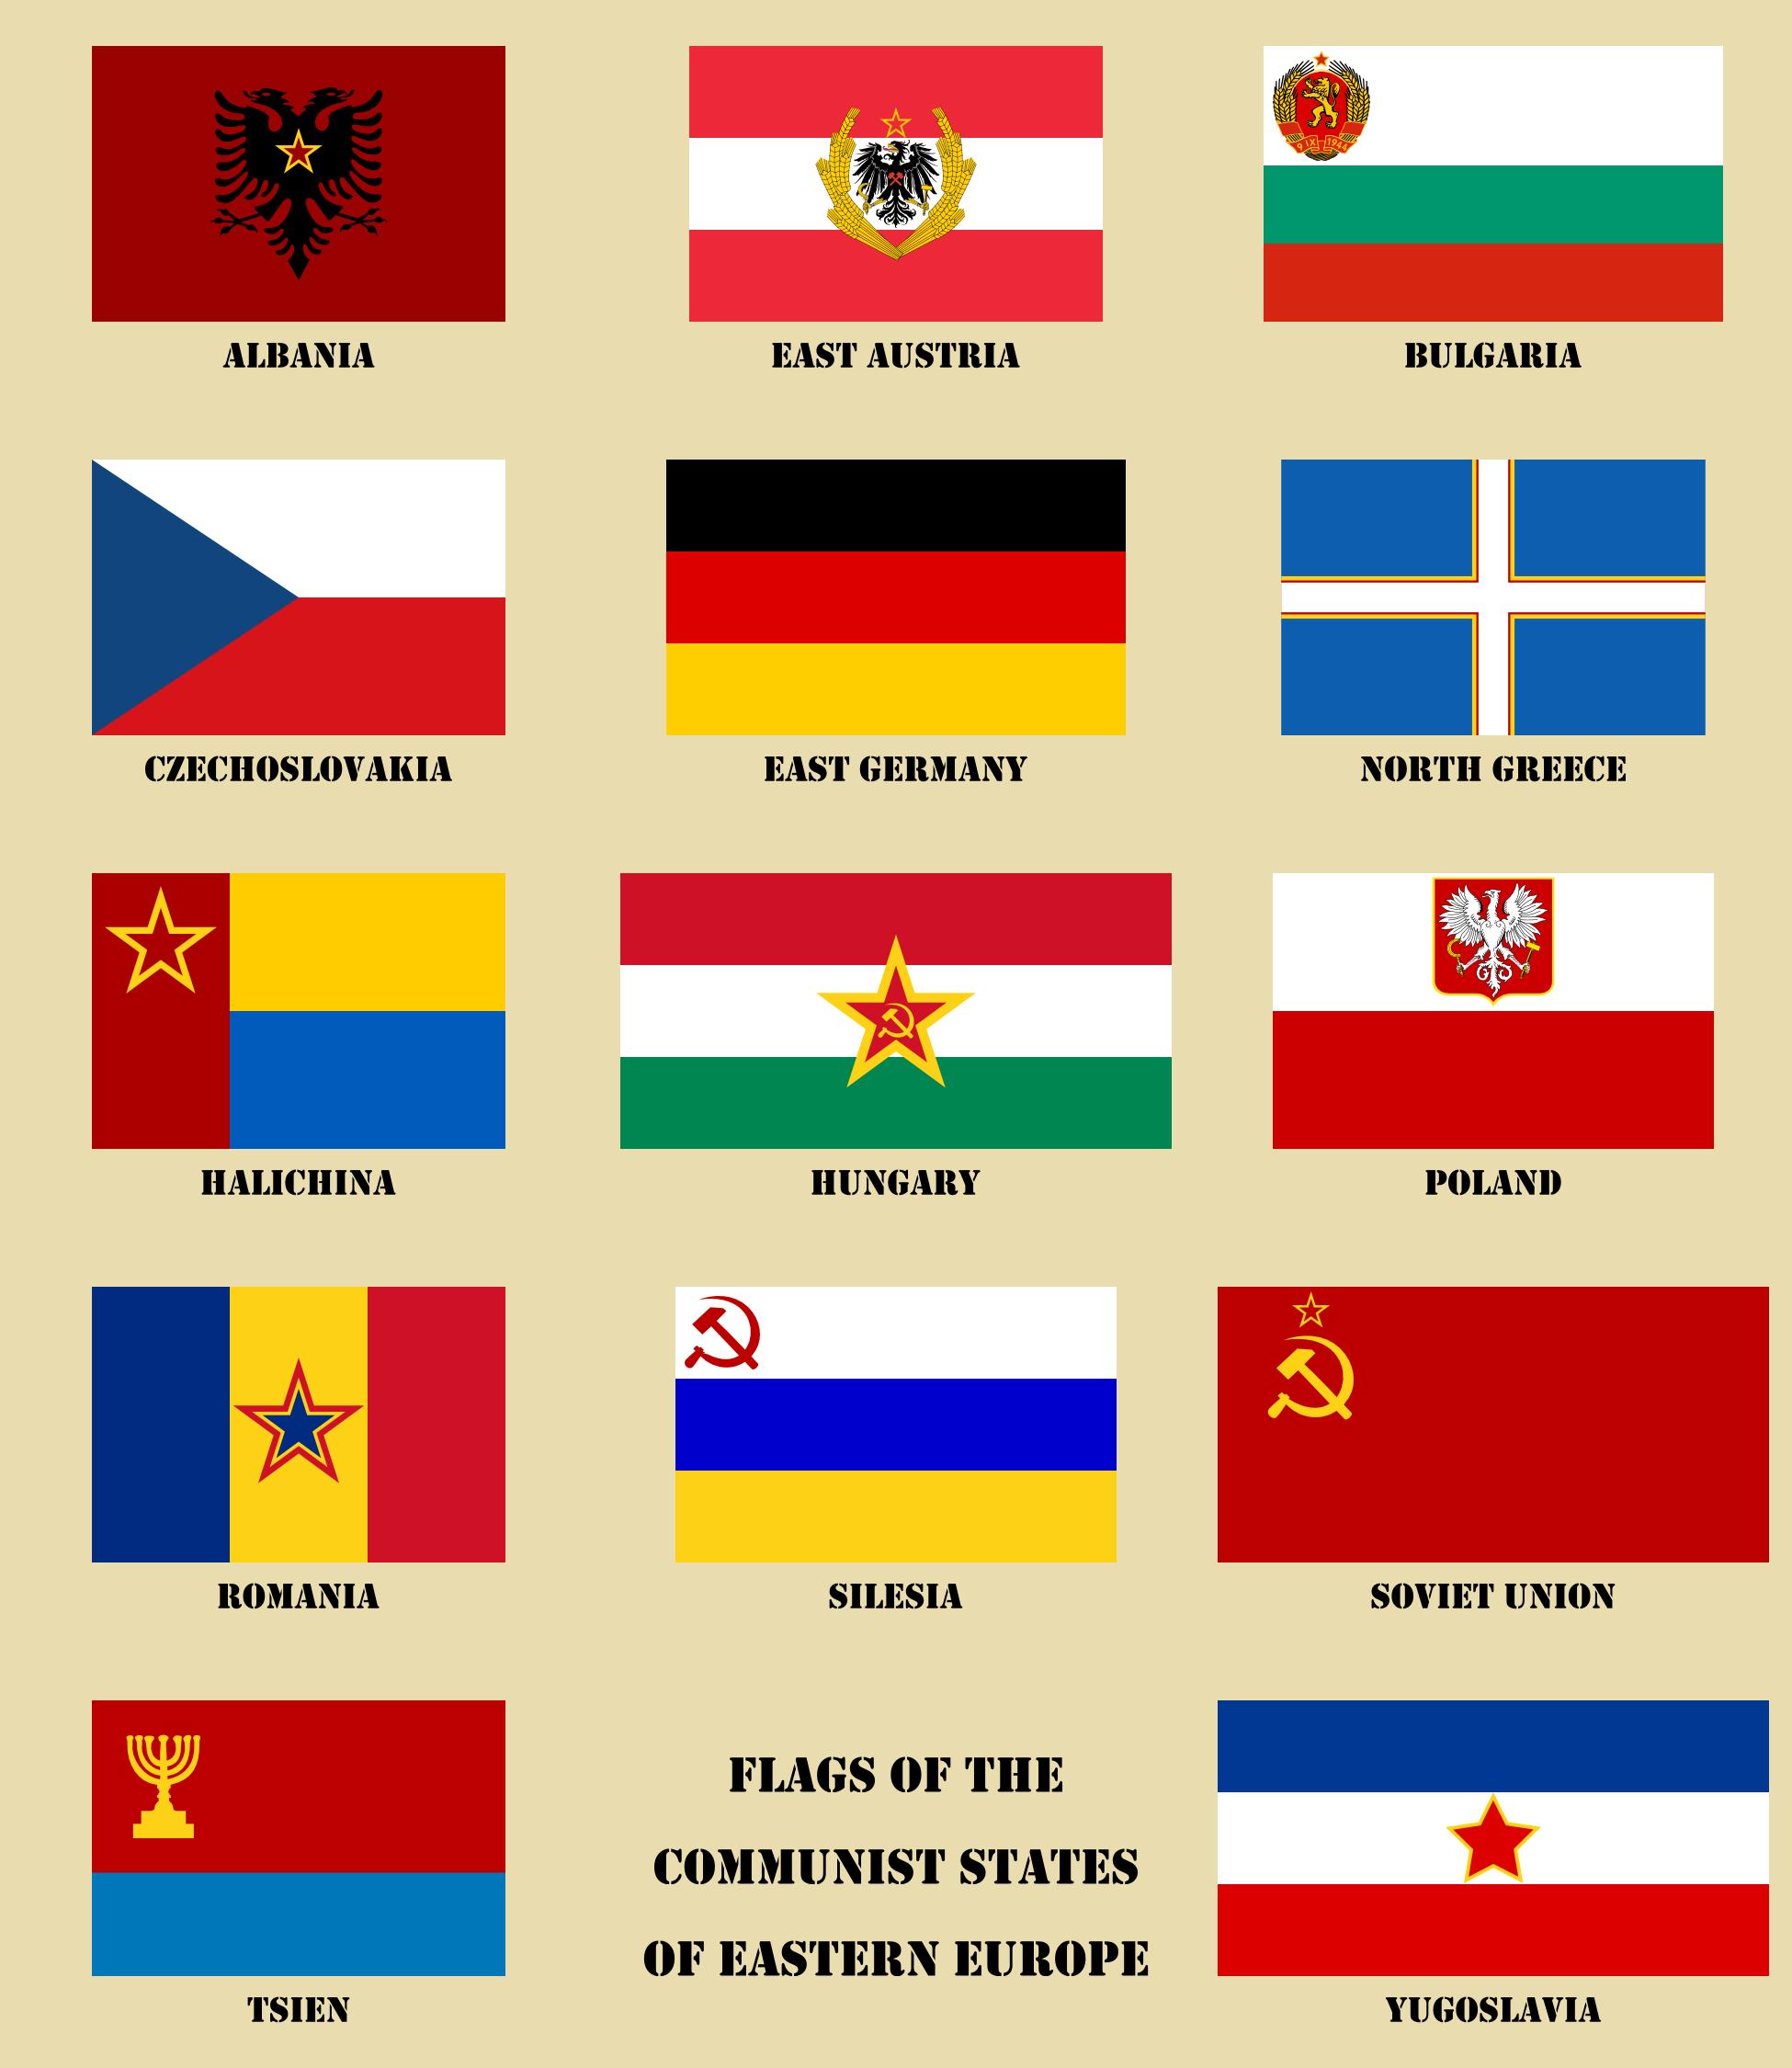 east german republic